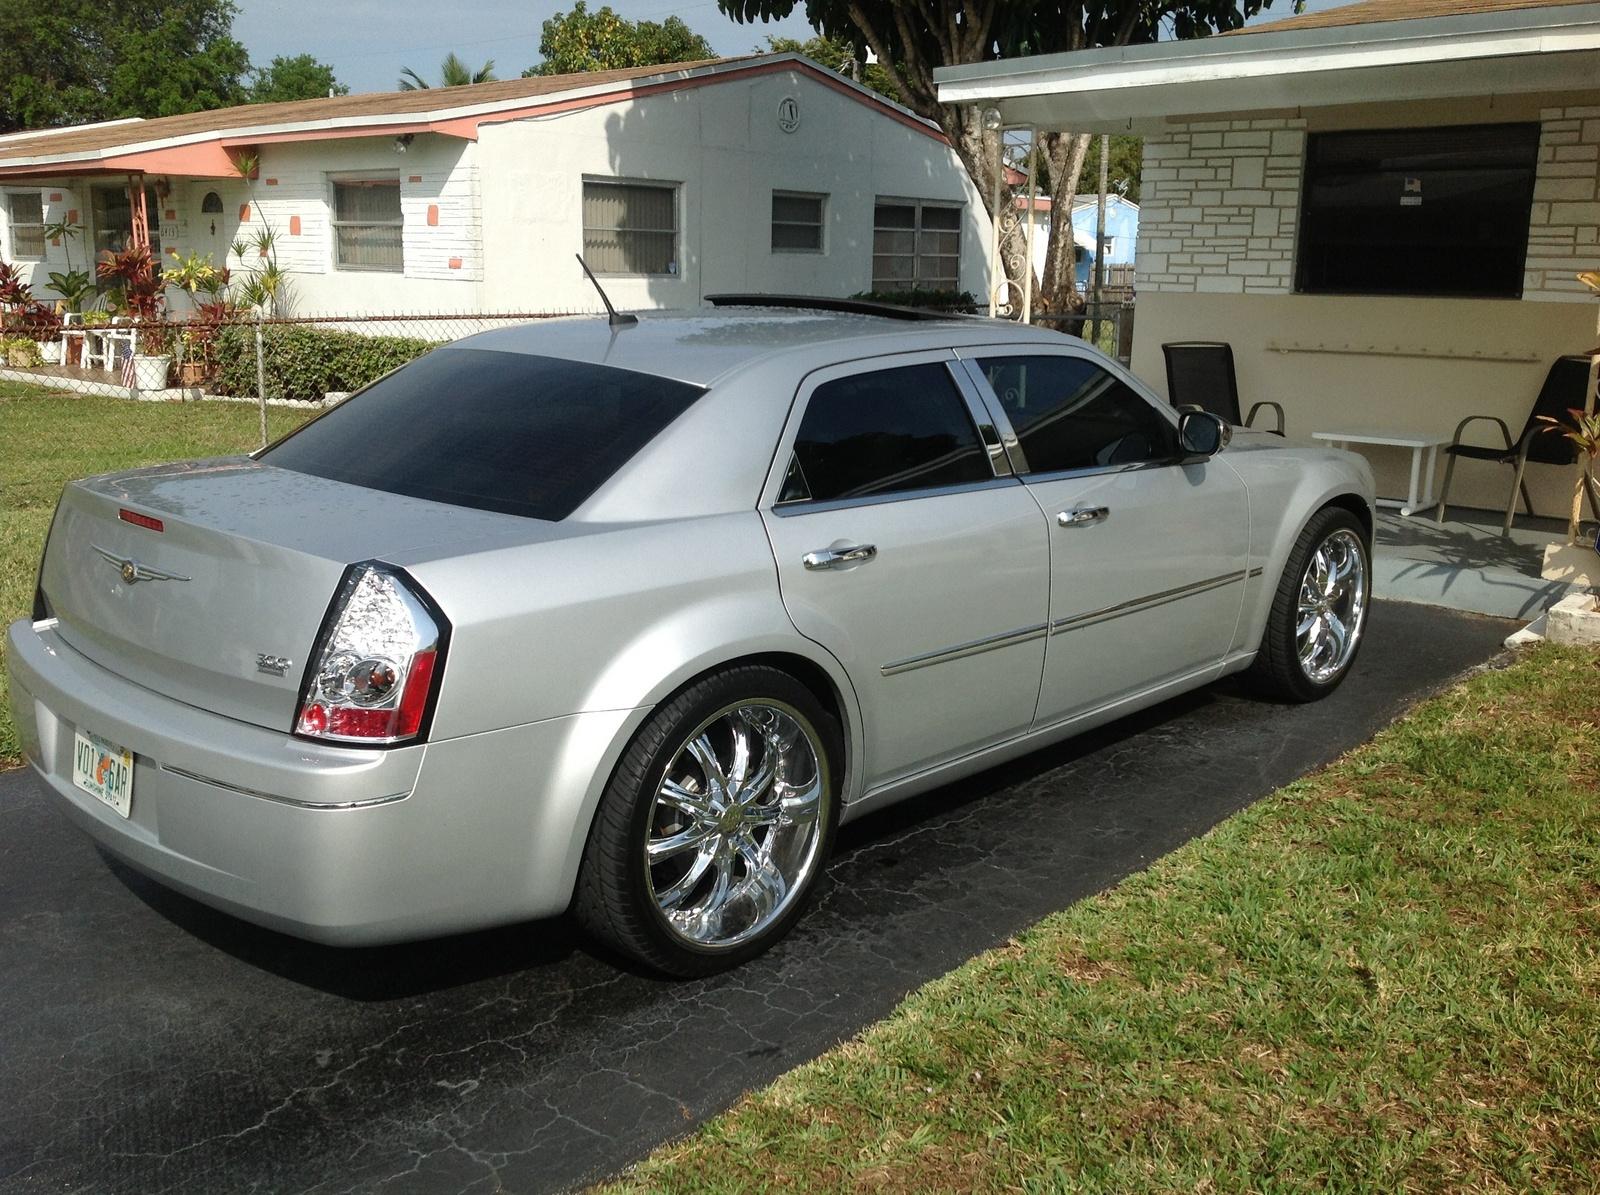 2008 Chrysler 300 Pictures Cargurus